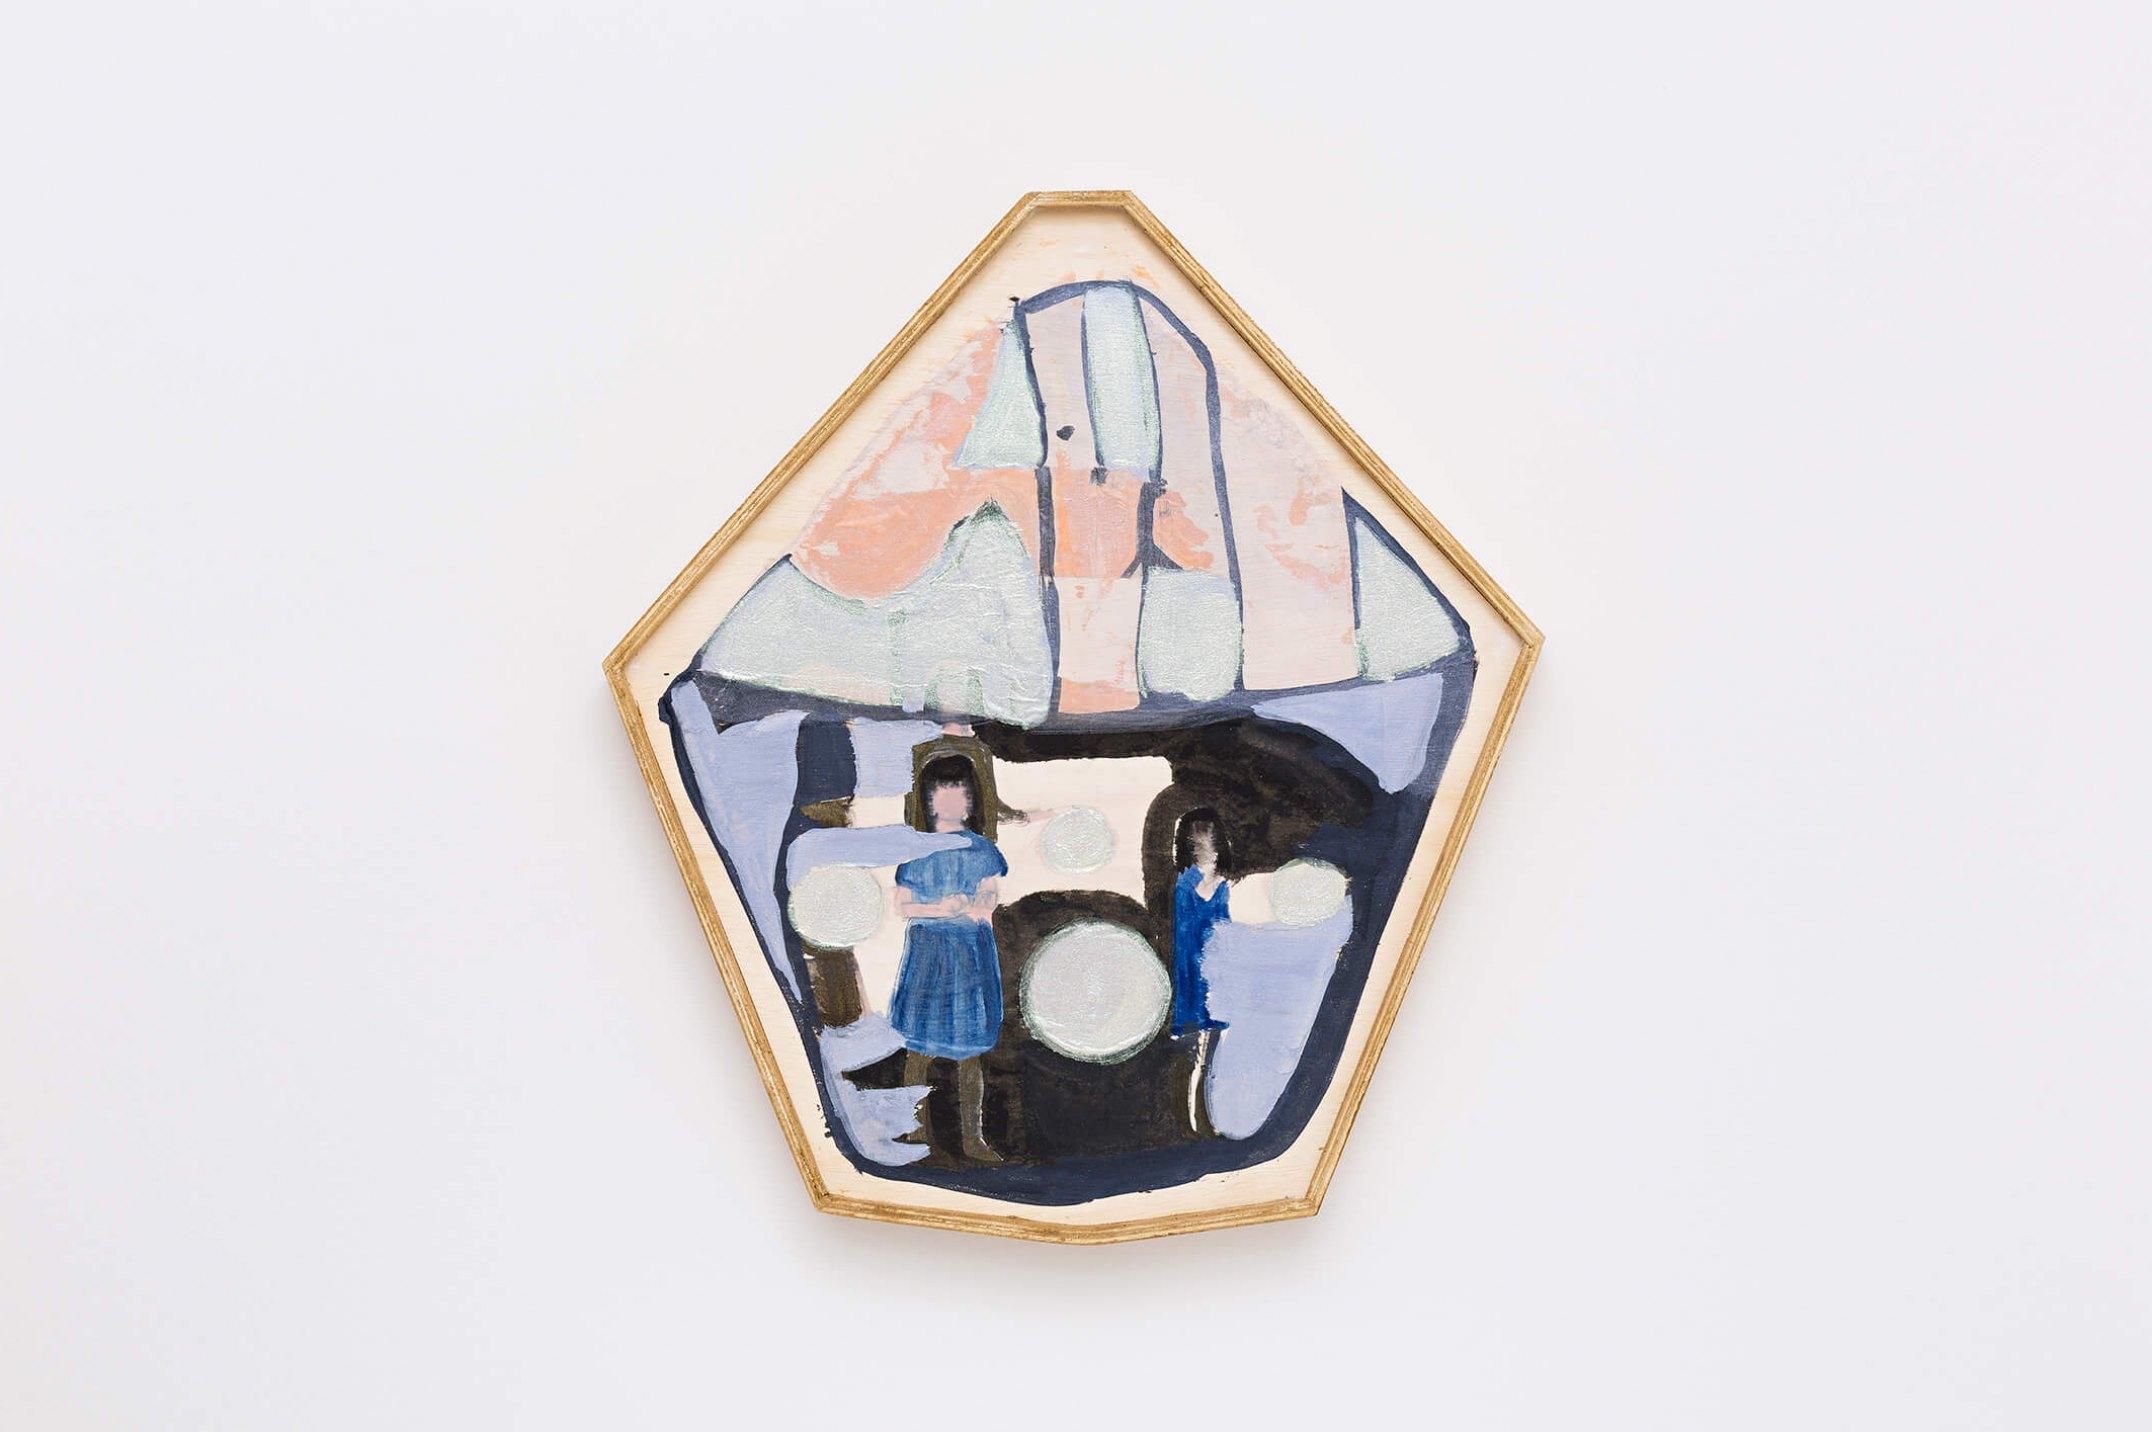 Marina Perez Simão,<em>untitled</em>, 2015, acrylic and iridescent pigment on paper assembled on wood, 54 × 46 cm - Mendes Wood DM